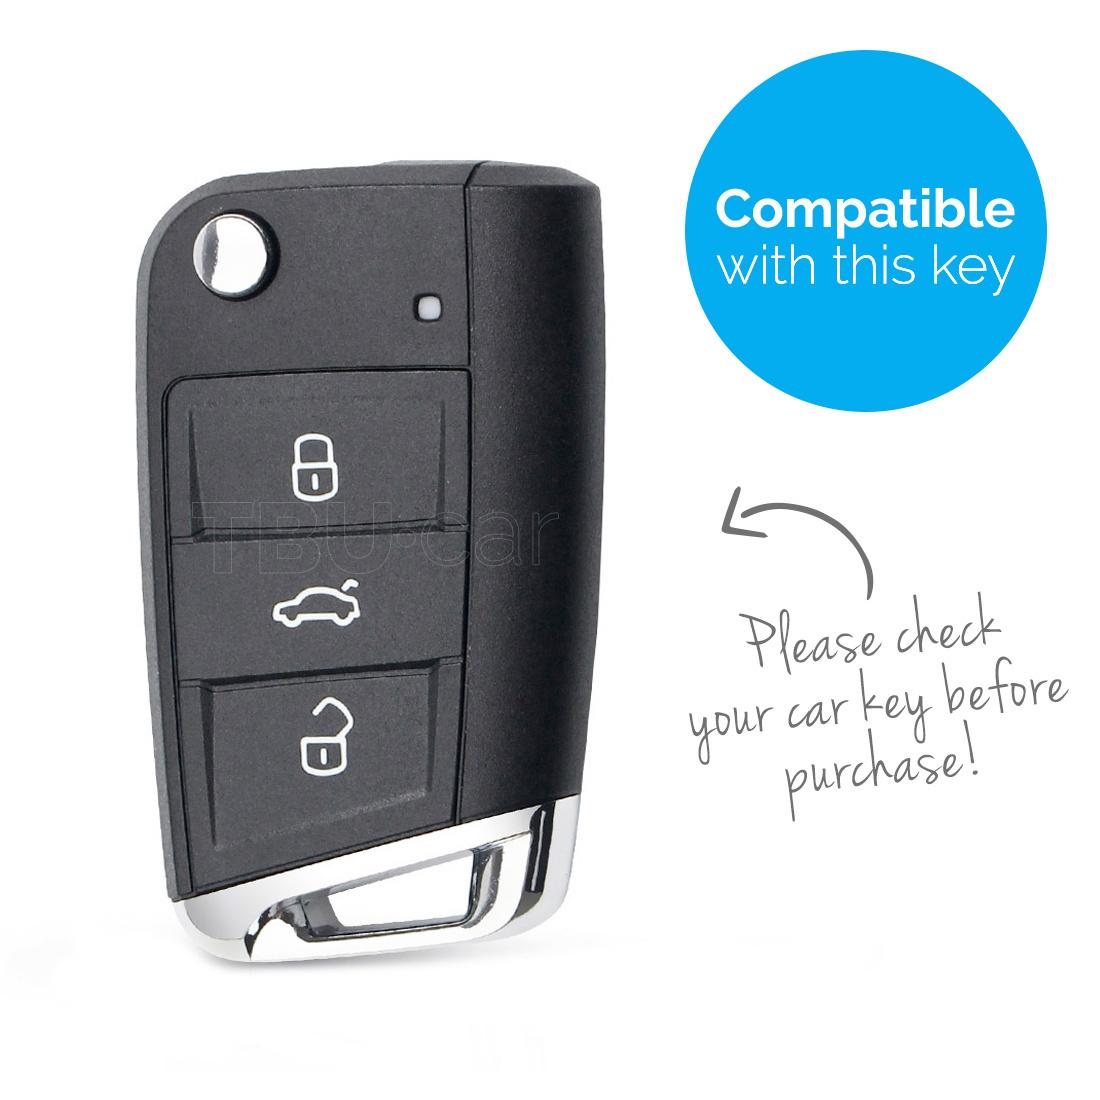 TBU car TBUCAR Sleutel cover compatibel met Audi - Silicone sleutelhoesje - beschermhoesje autosleutel - Oranje